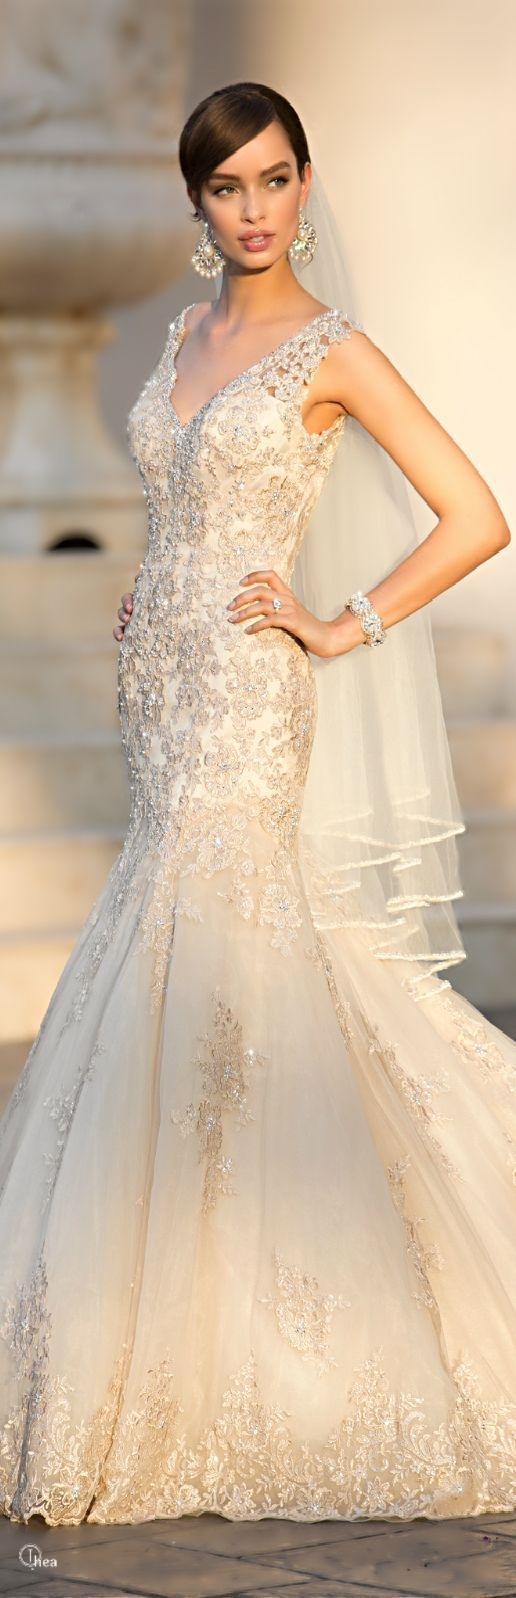 Pink wedding gown ~